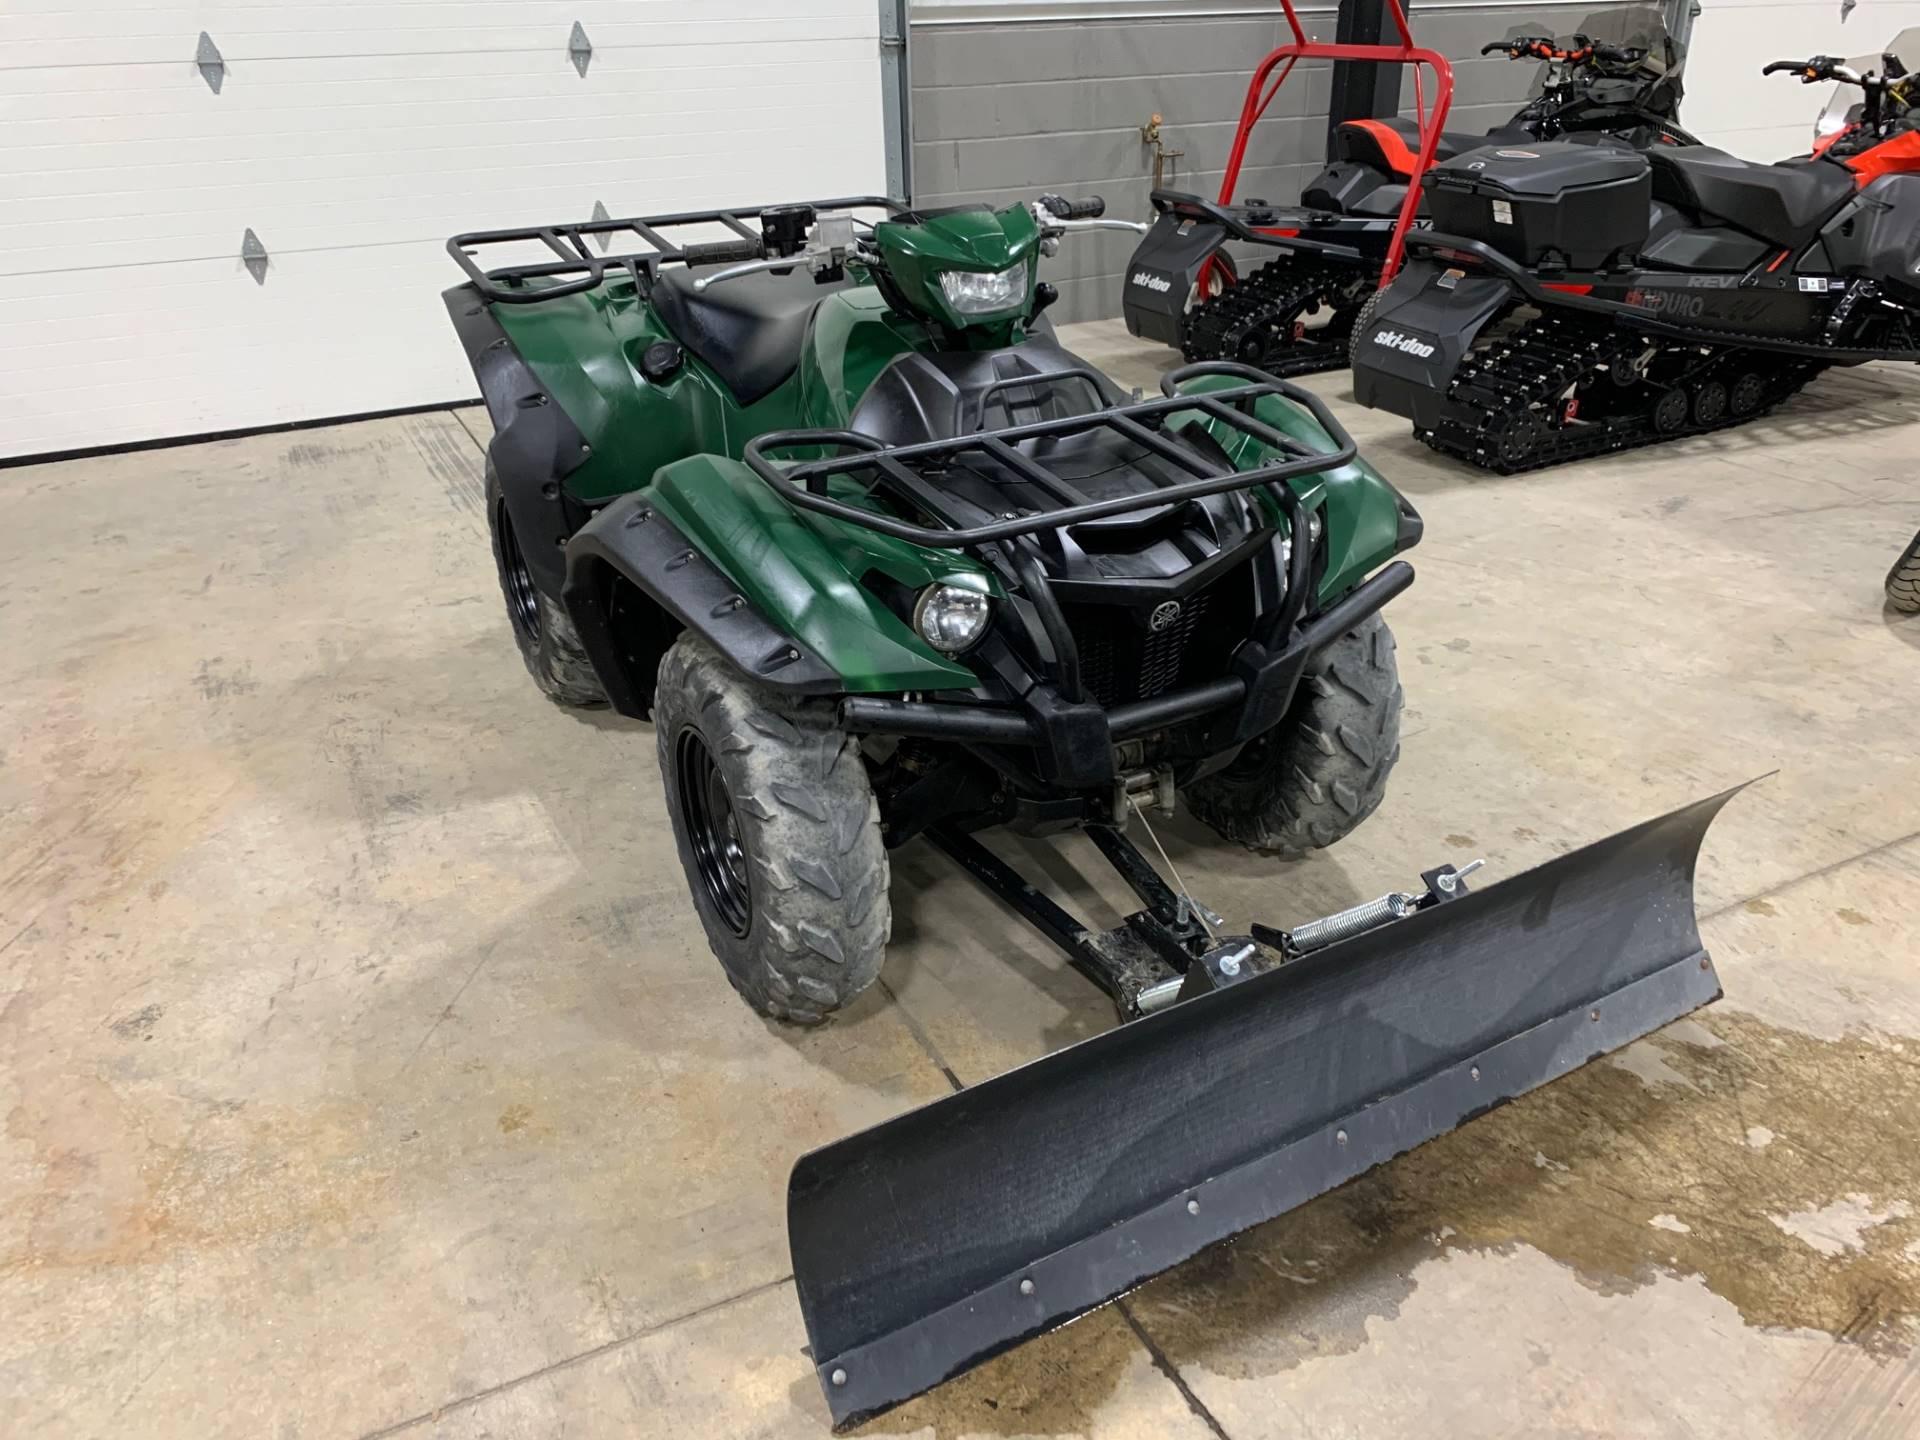 2017 Kodiak 700 EPS